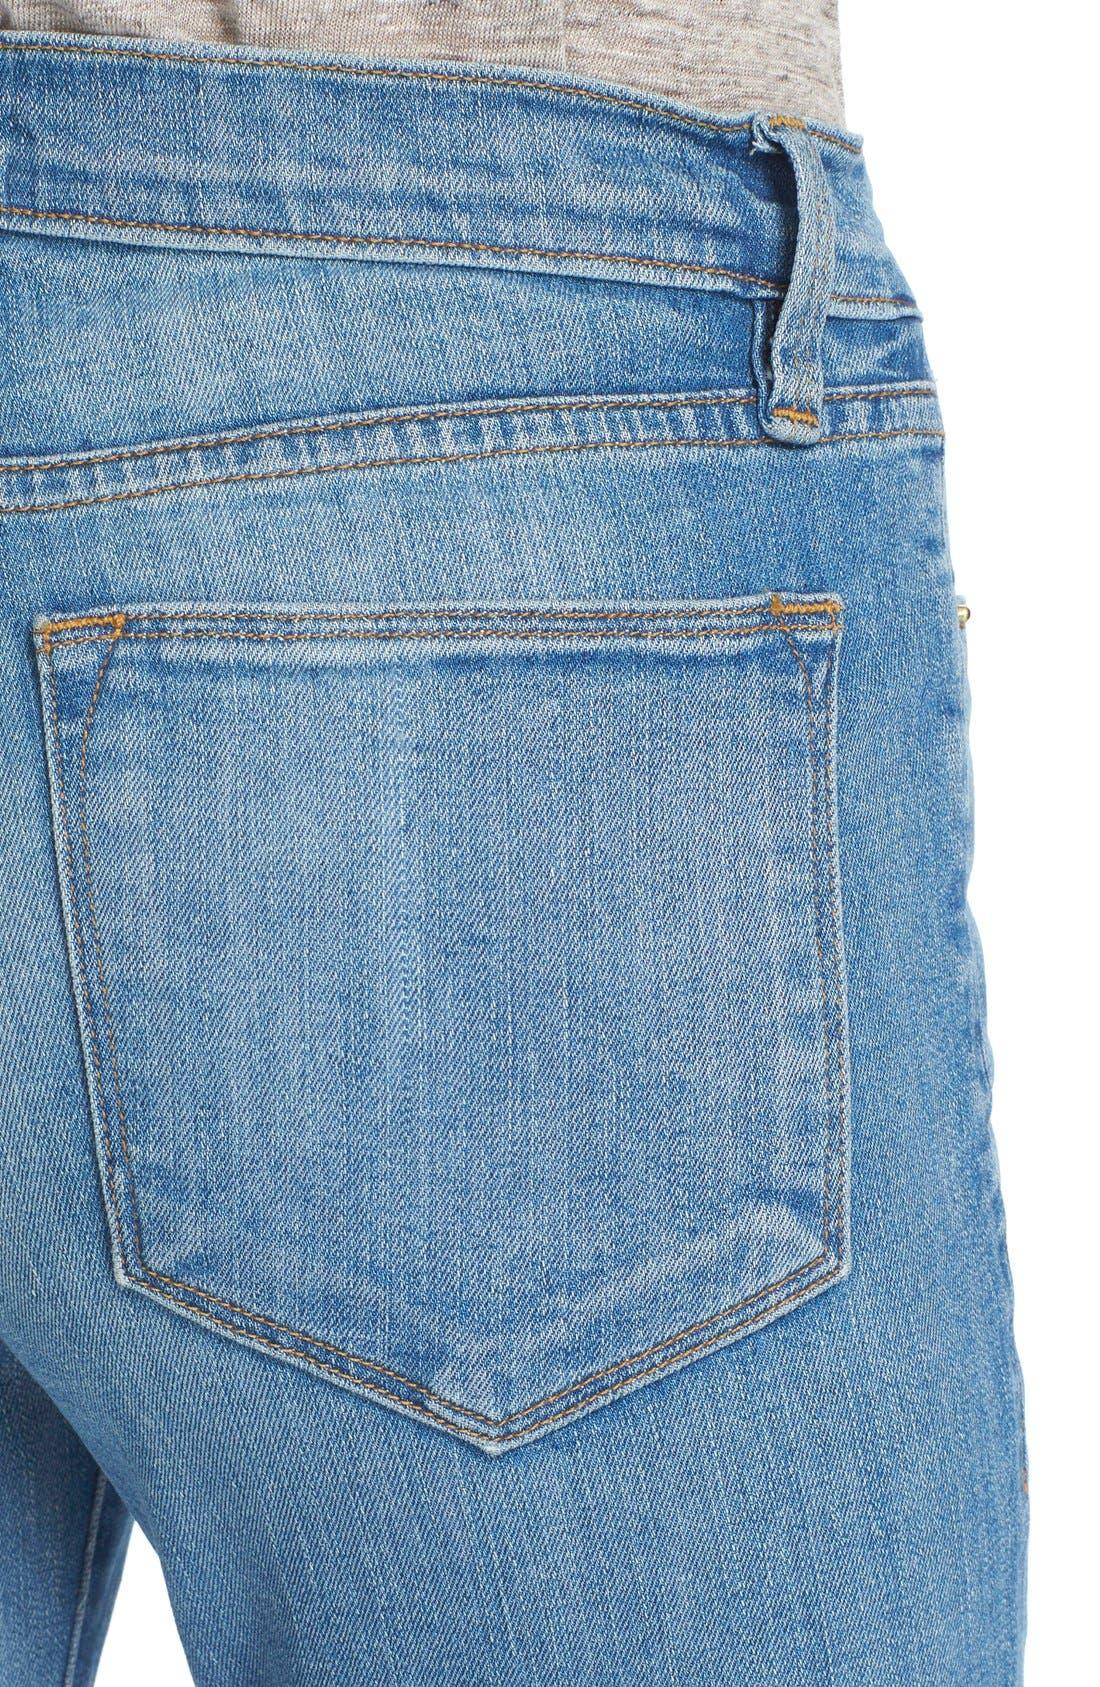 'Le High Flare' Jeans,                             Alternate thumbnail 11, color,